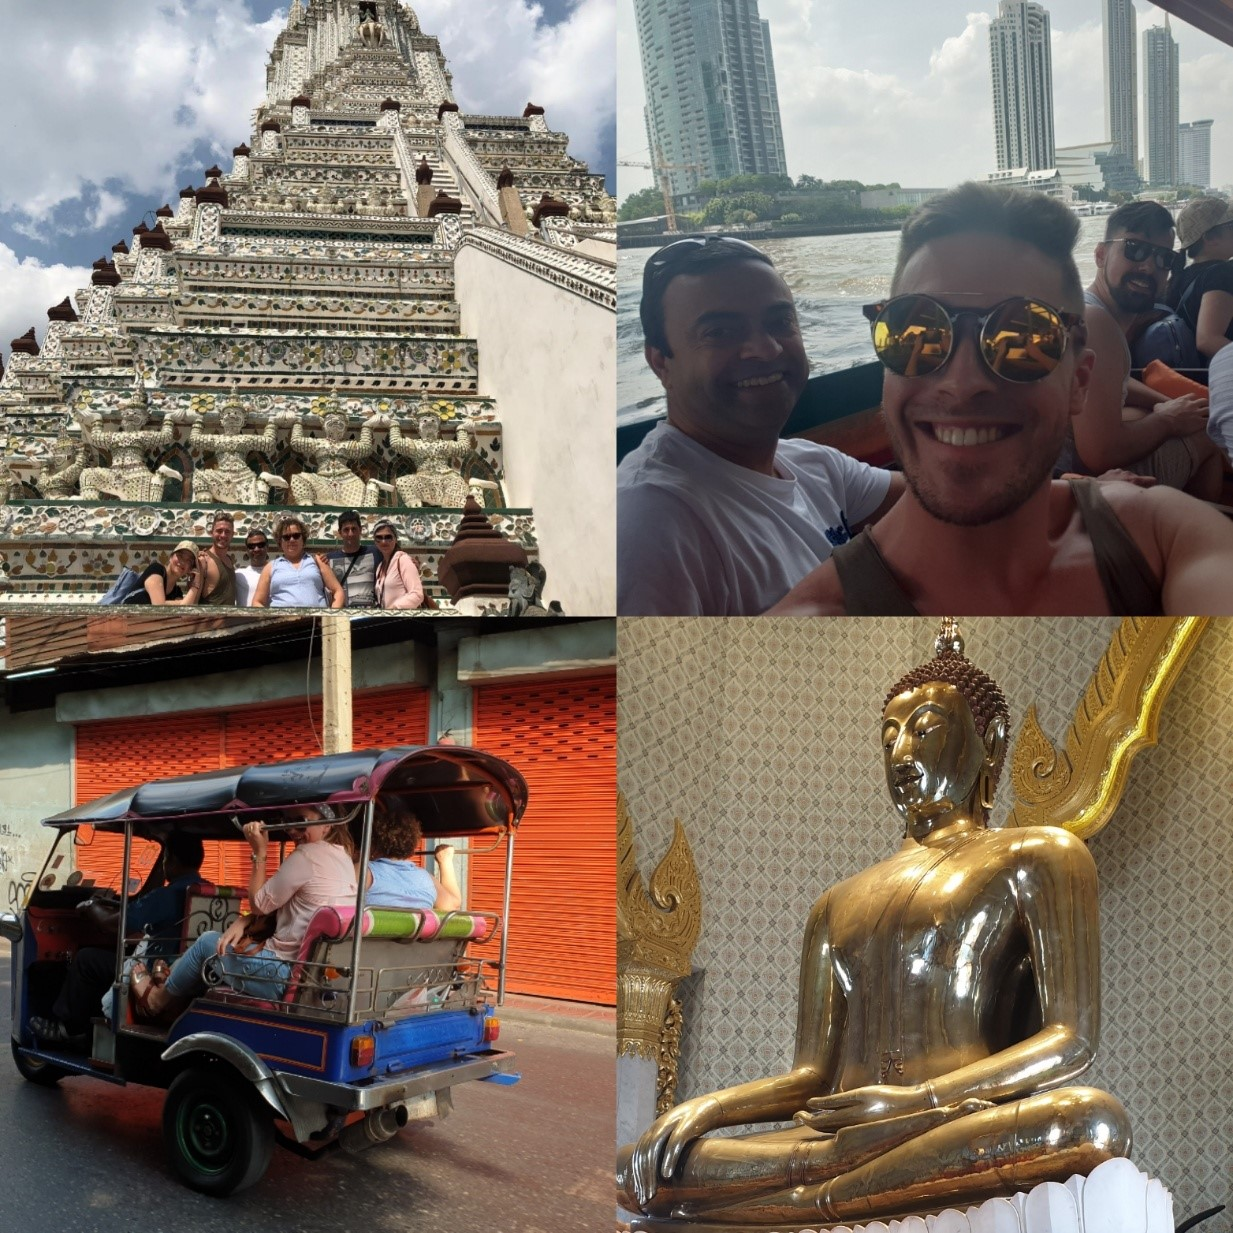 Fran blog - Thailand